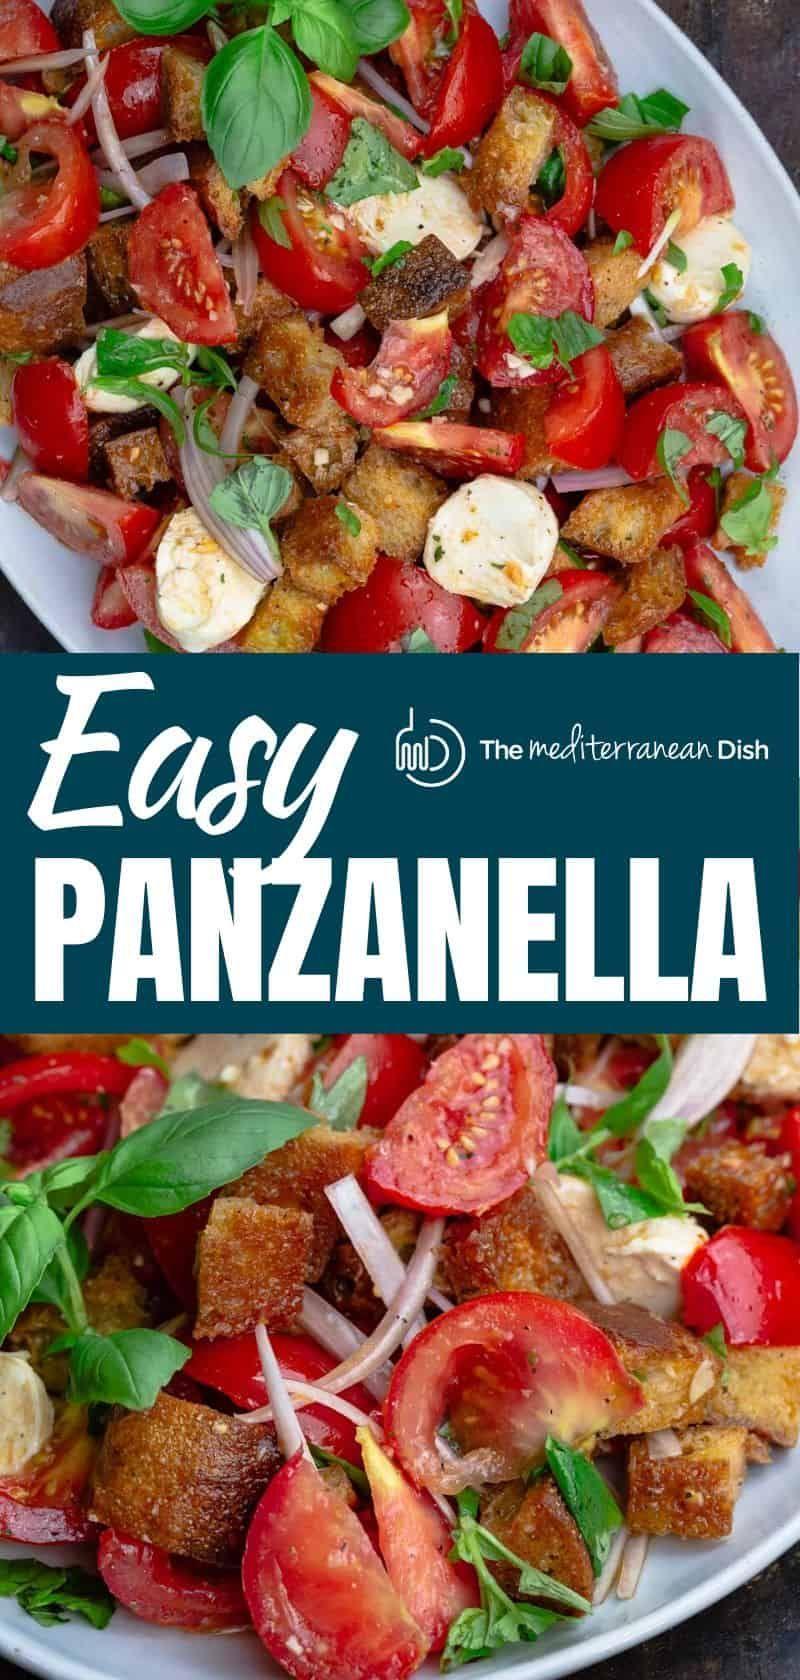 Photo of Simple Tomato Panzanella Salad